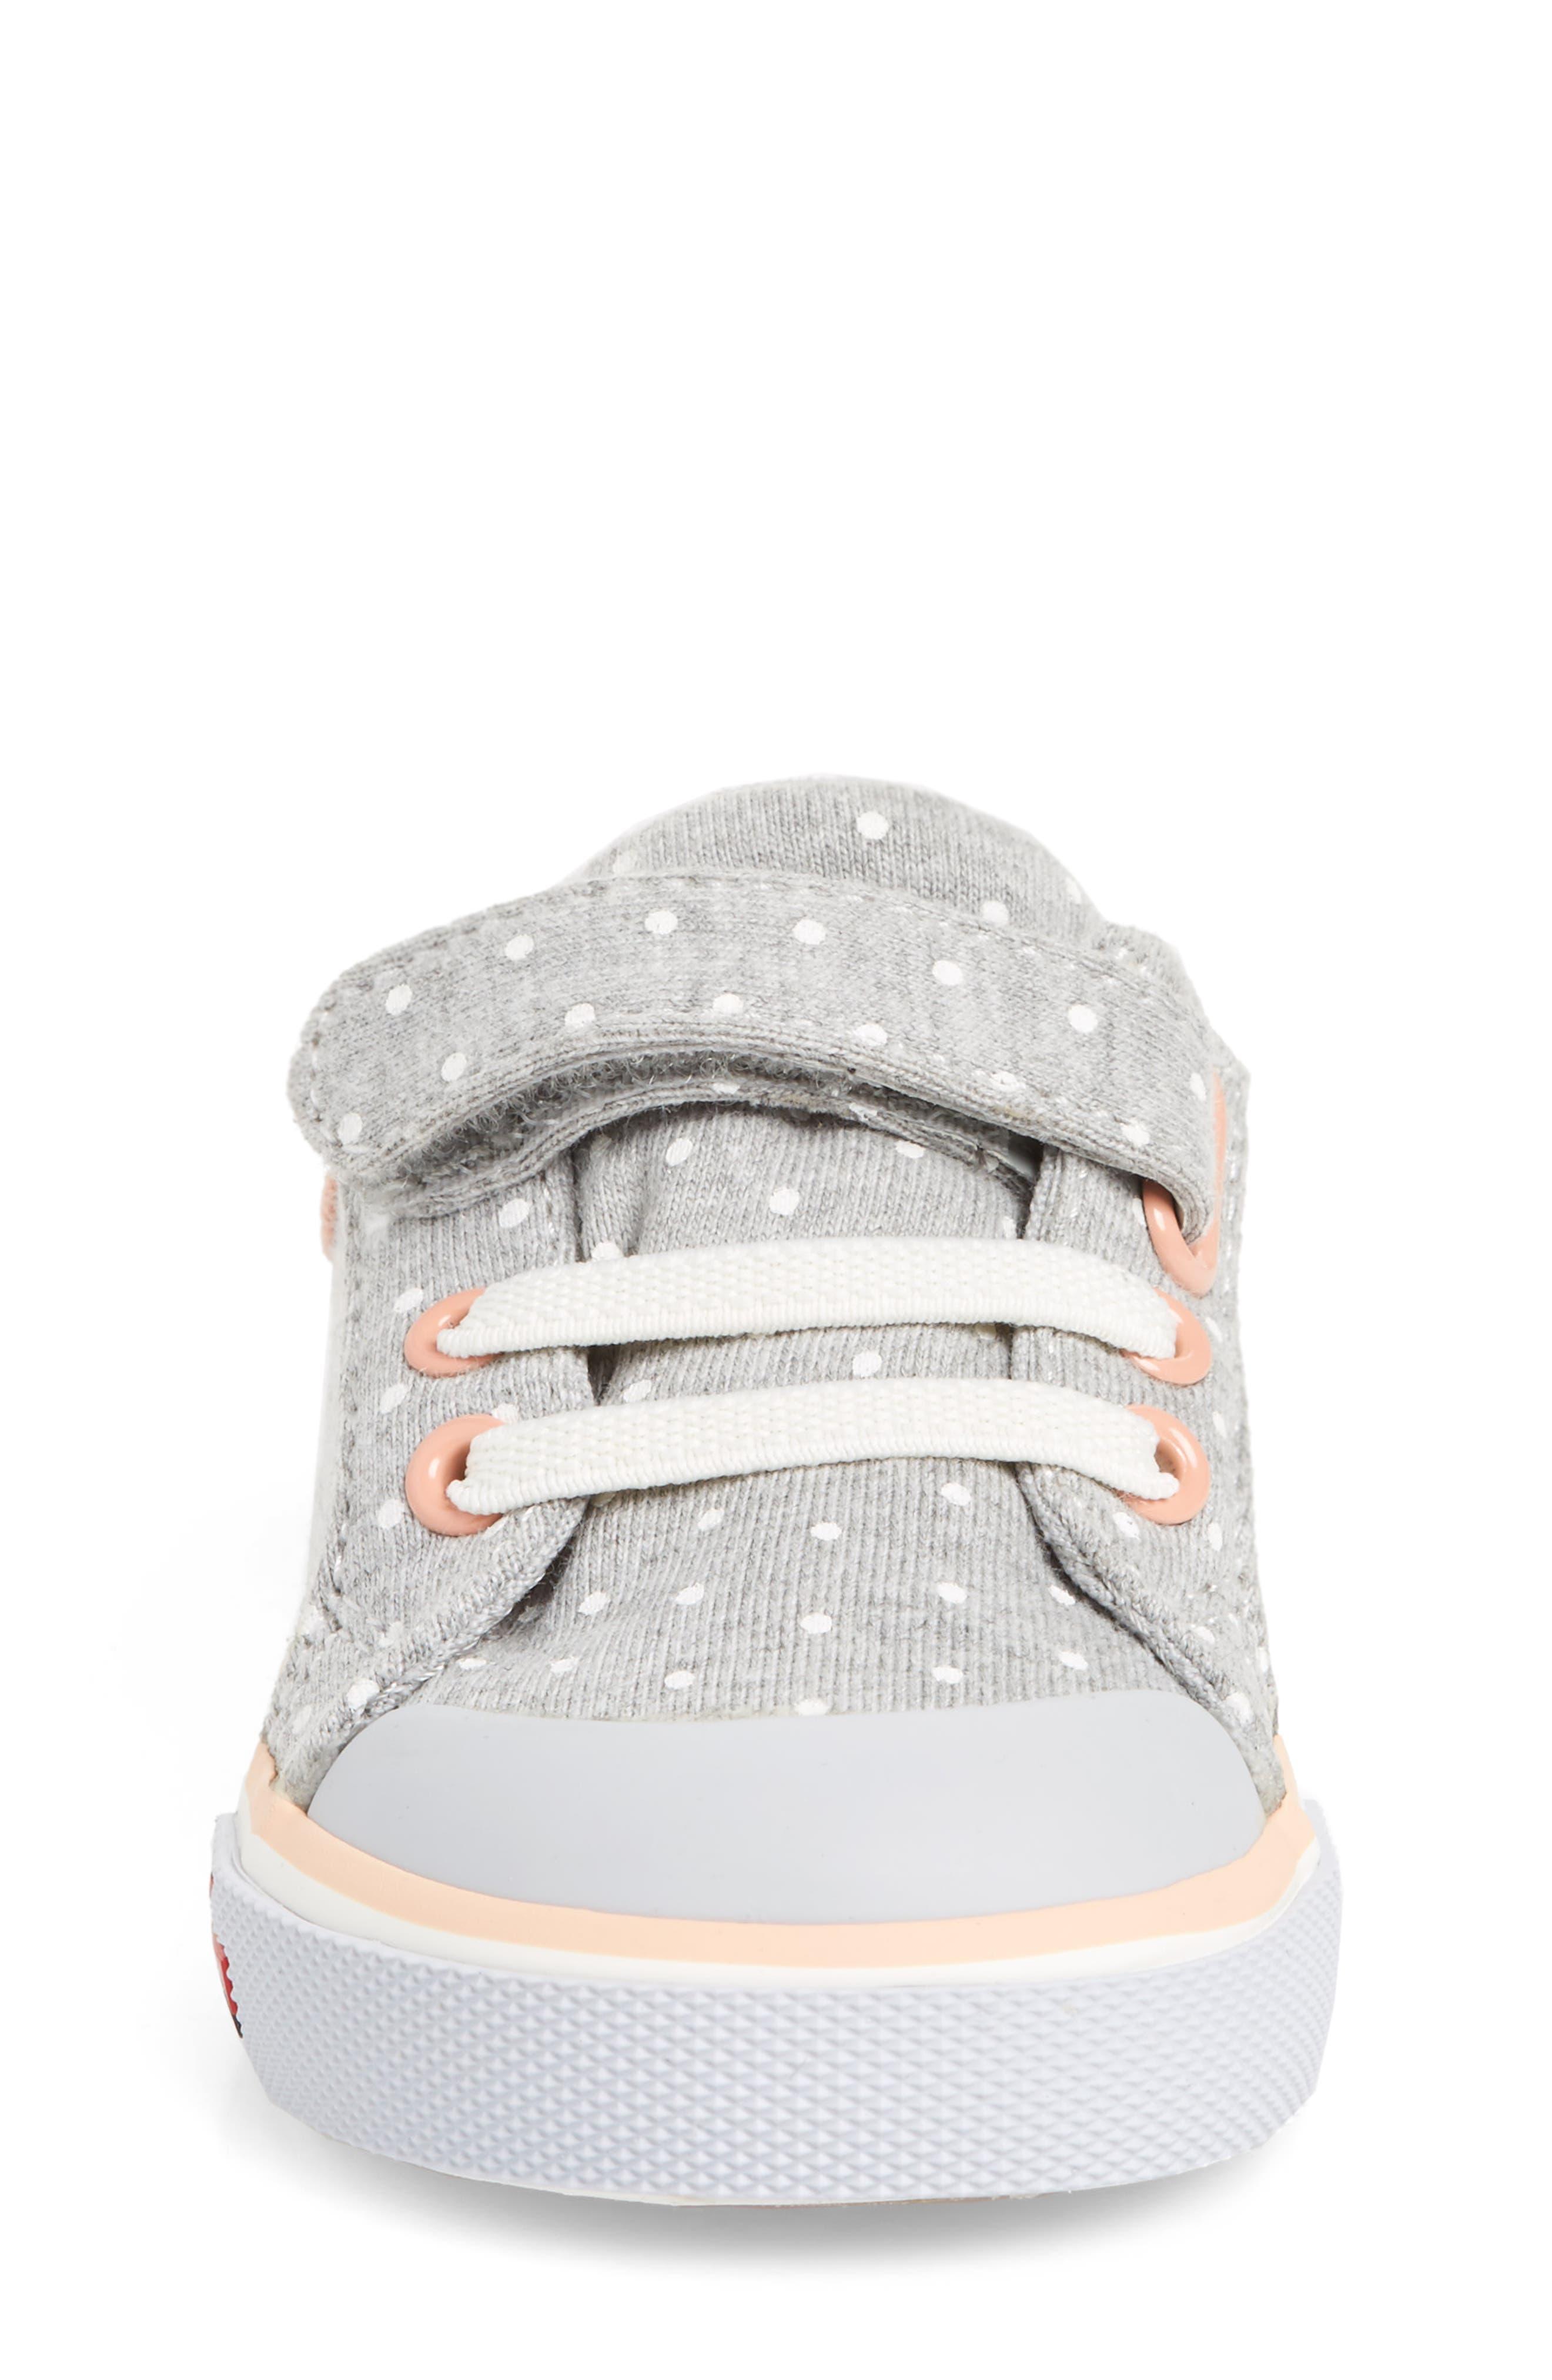 Kristin Sneaker,                             Alternate thumbnail 4, color,                             023